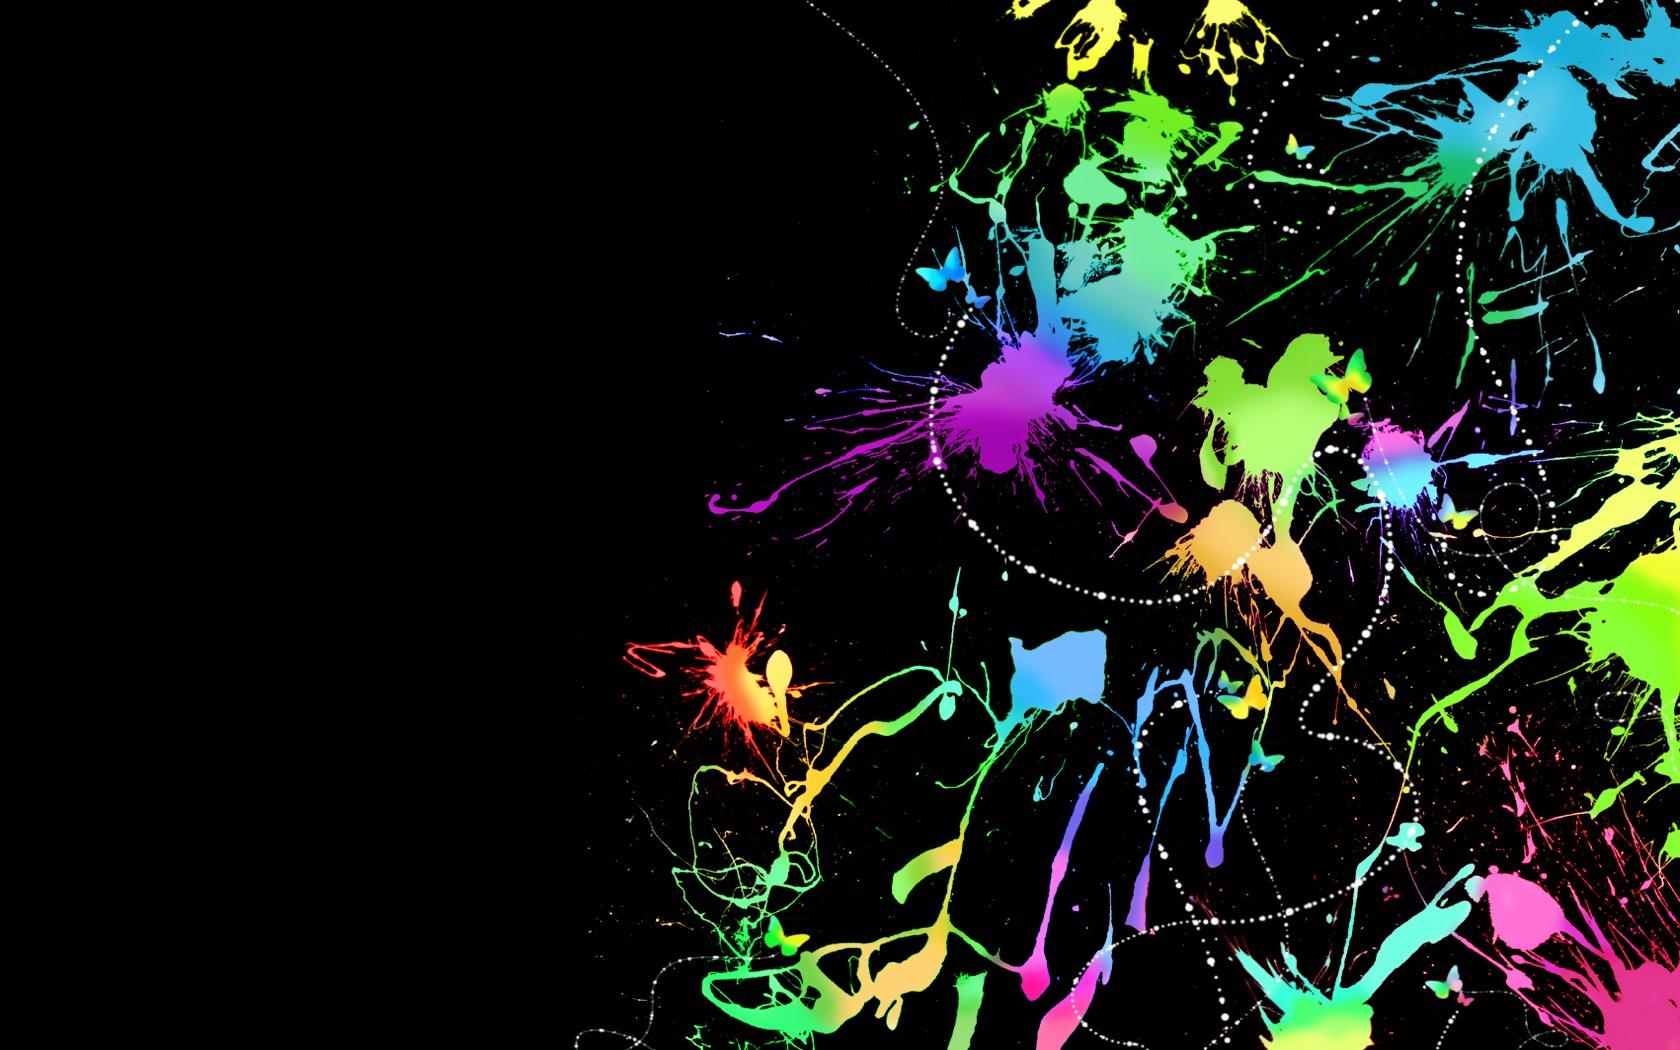 Colorful Wallpaper Hd Desktop Hd Wallpapers Desktop Black And Colorful Backgrounds 2417475 Hd Wallpaper Backgrounds Download